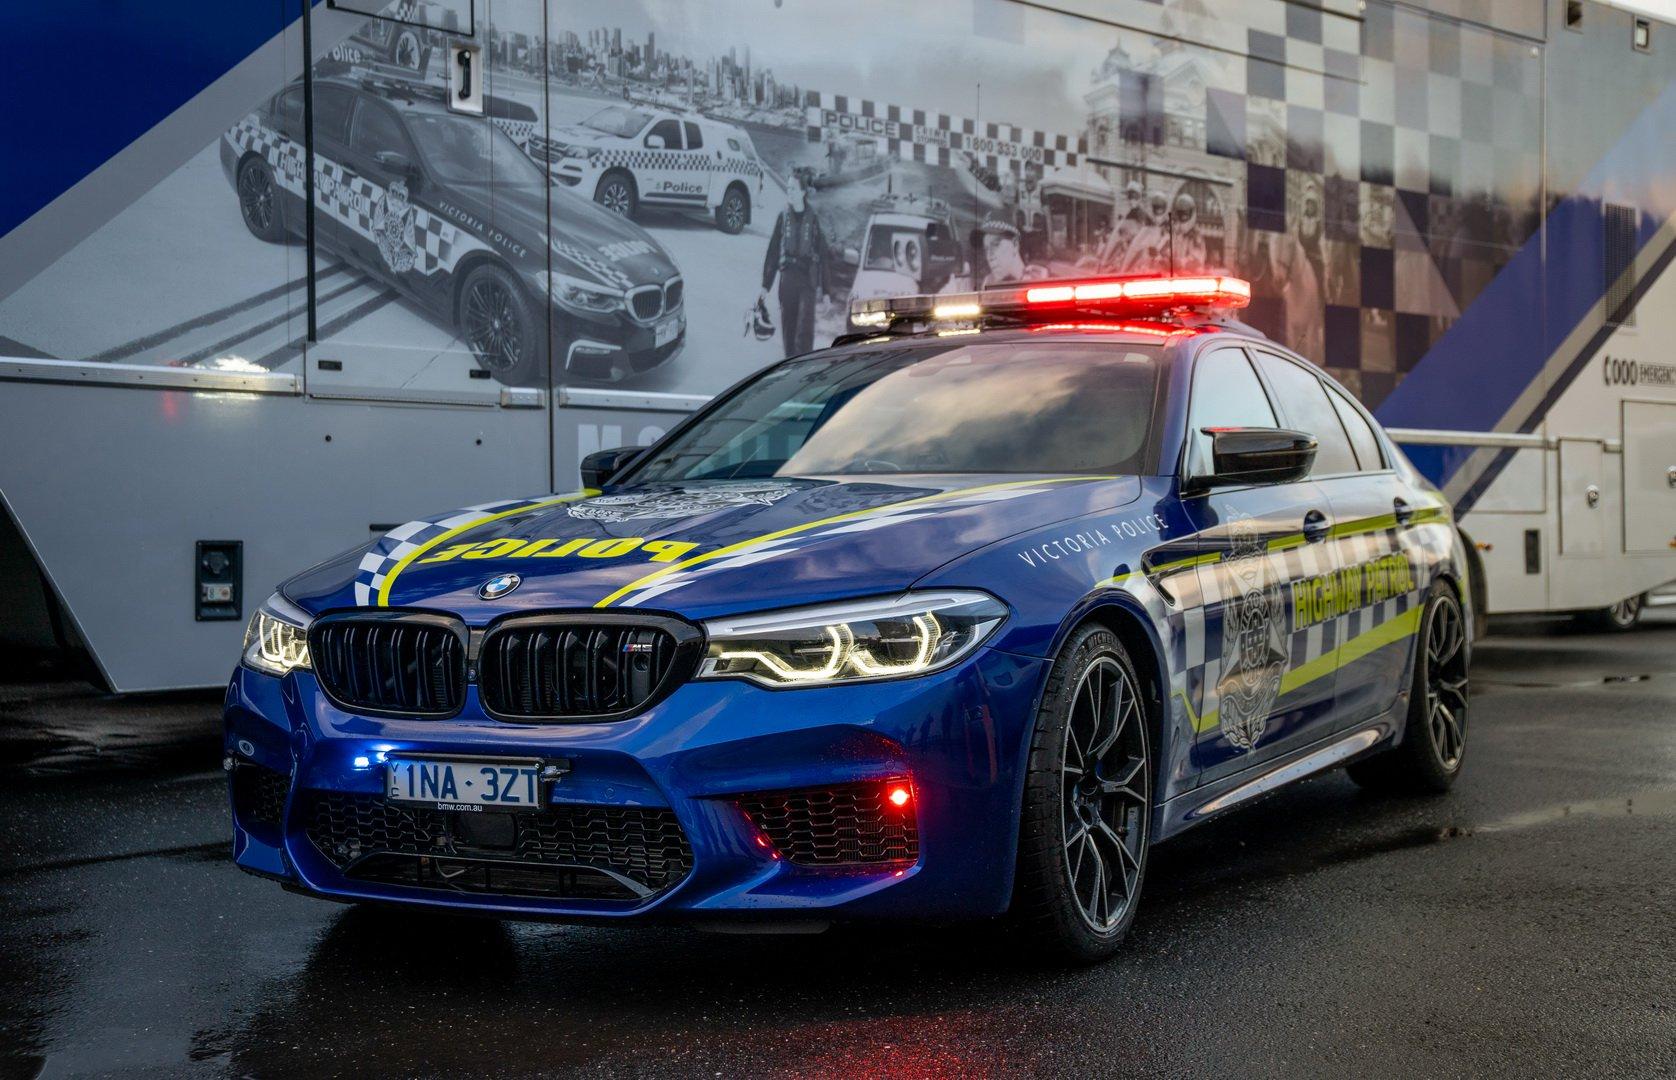 0edb162a-bmw-m5-competition-australia-police-3